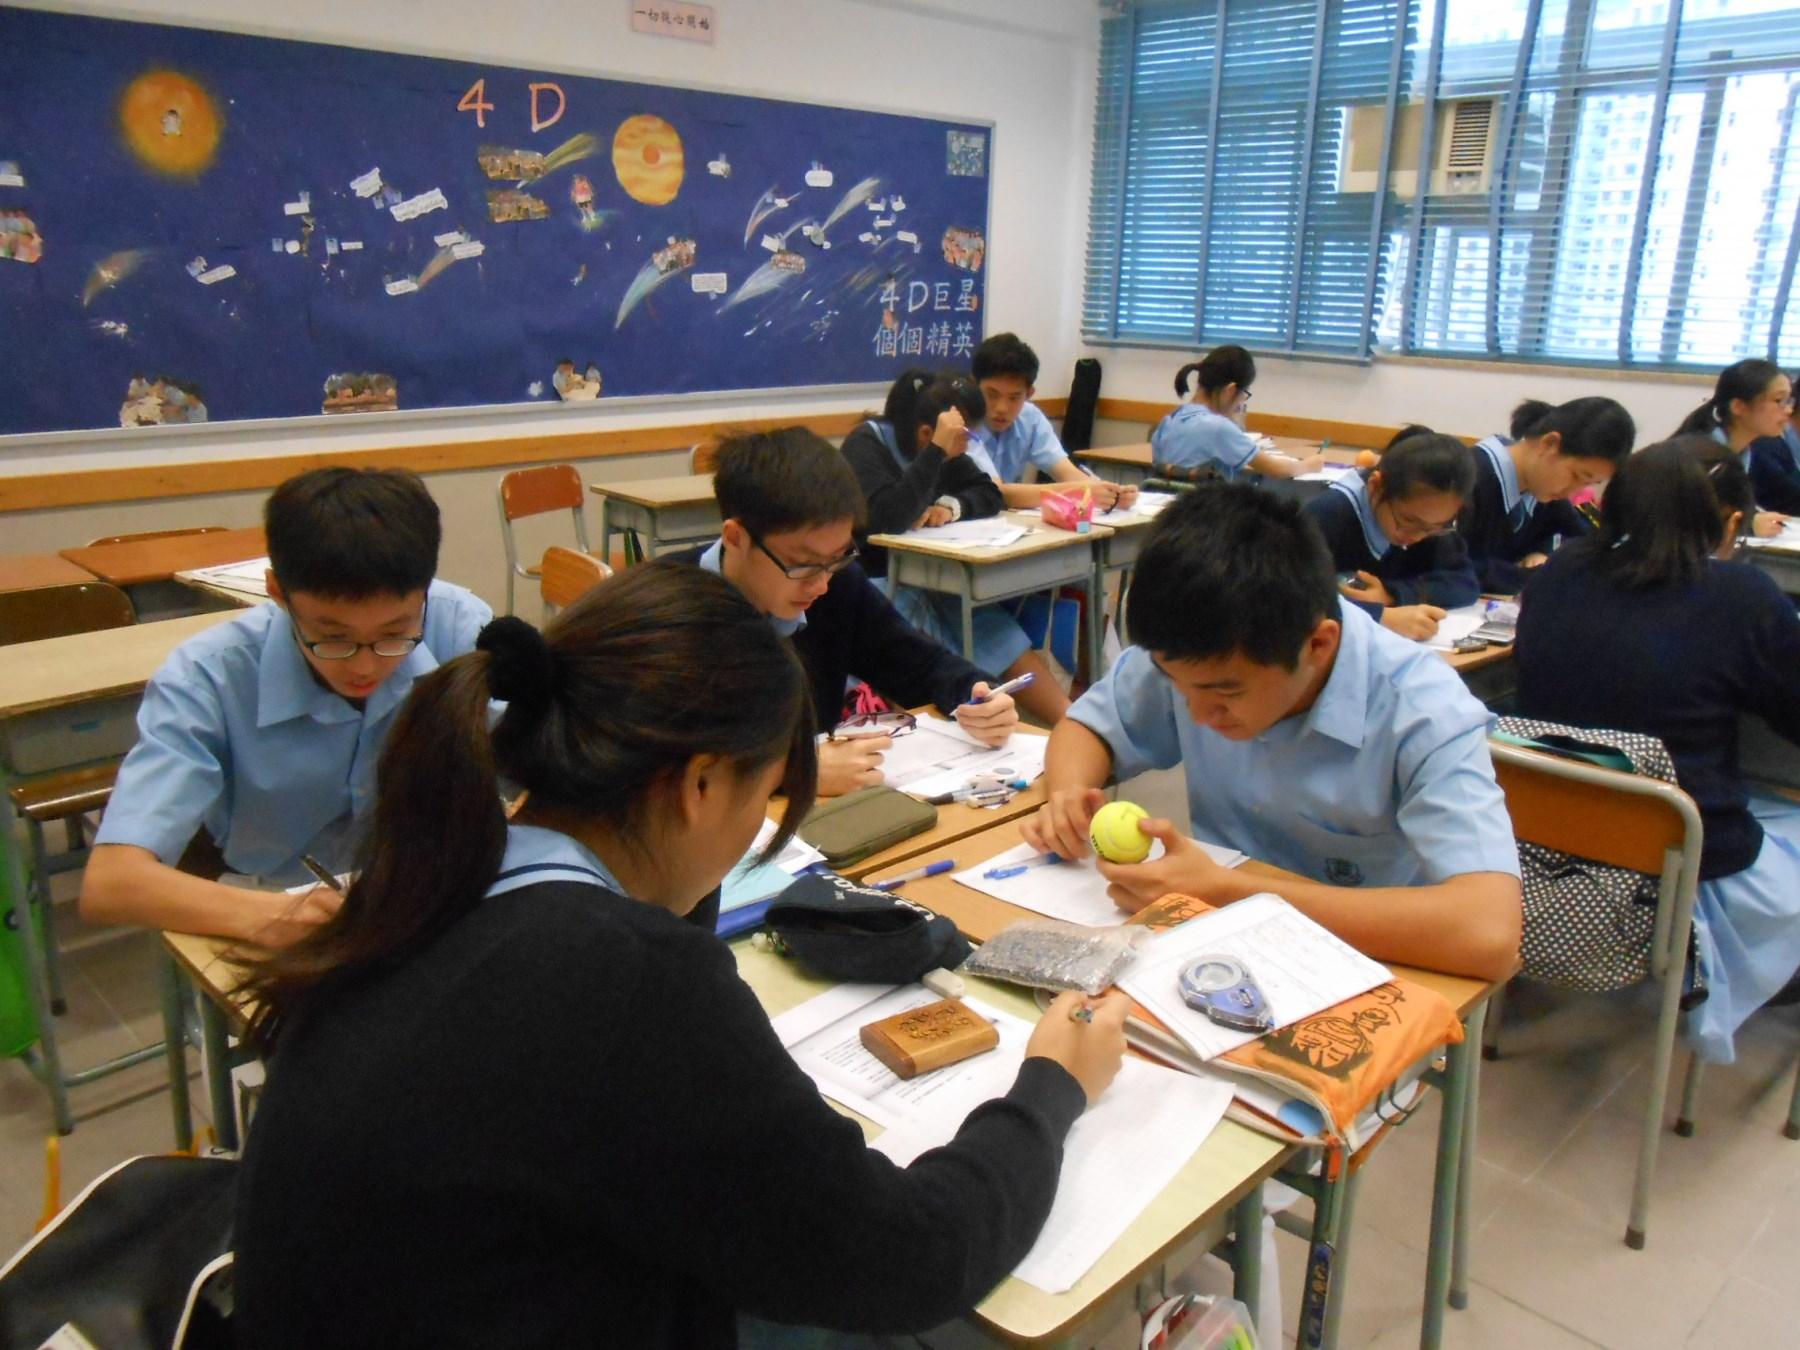 http://npc.edu.hk/sites/default/files/dscn9160.jpg